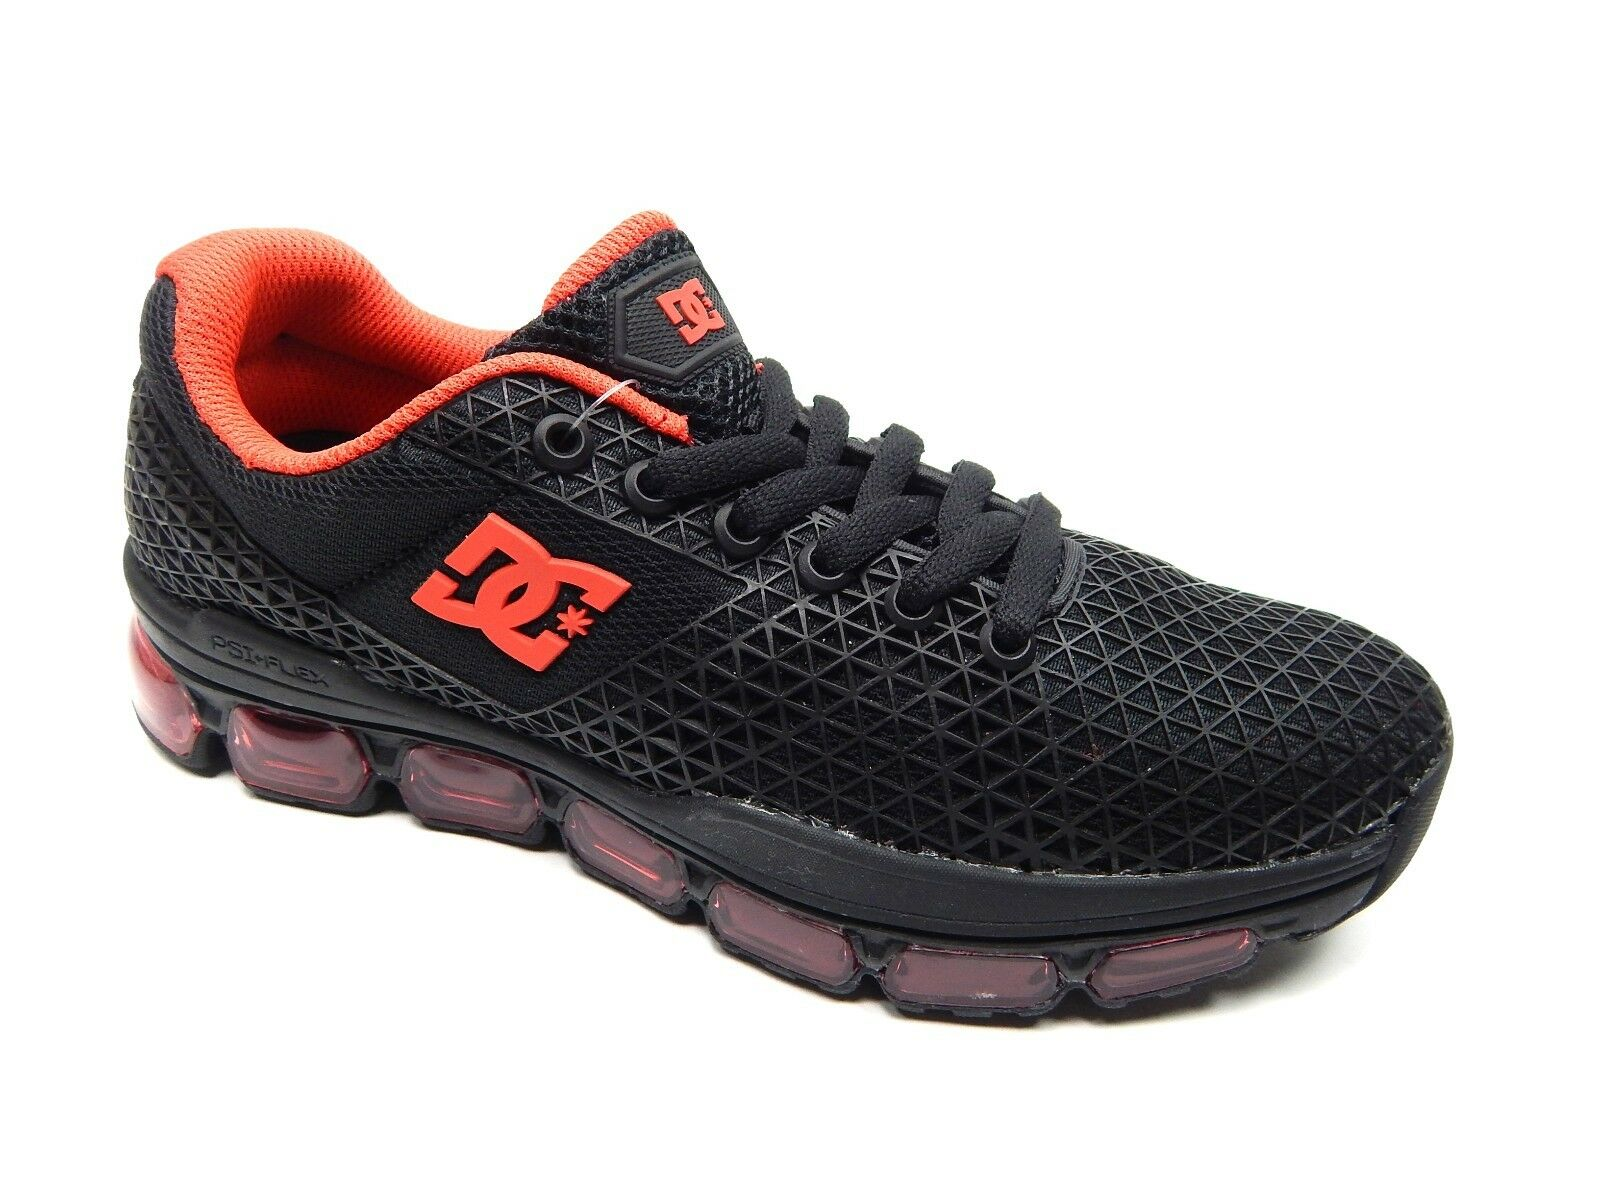 DC PSI + FLEX BLACK FLOURESCENT WOMEN Schuhe SIZE 7.5, 9 & 9.5